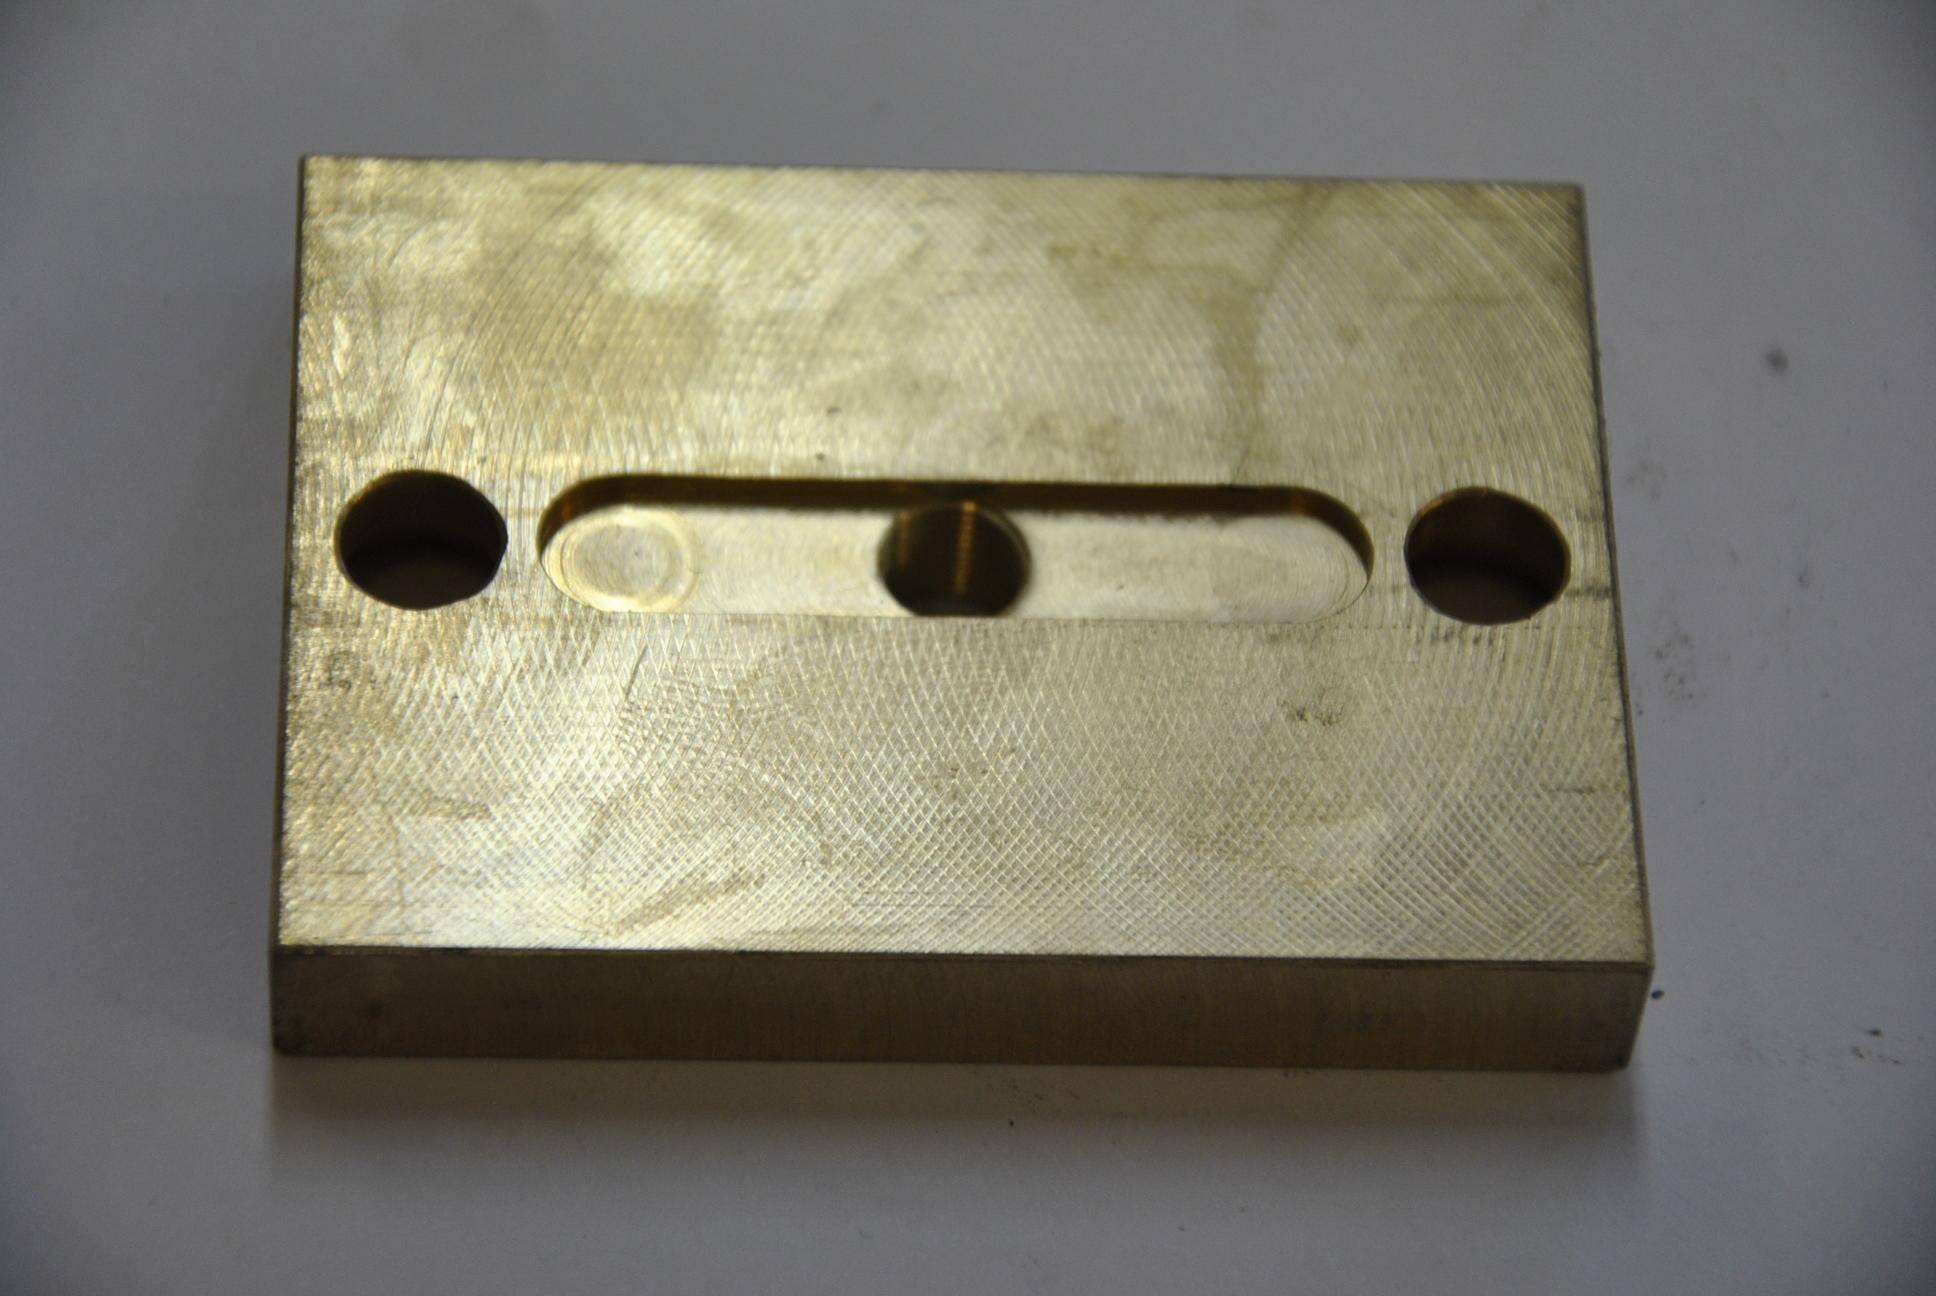 Направляющая пластина зубчатой рейки (узкая), 1 шт.